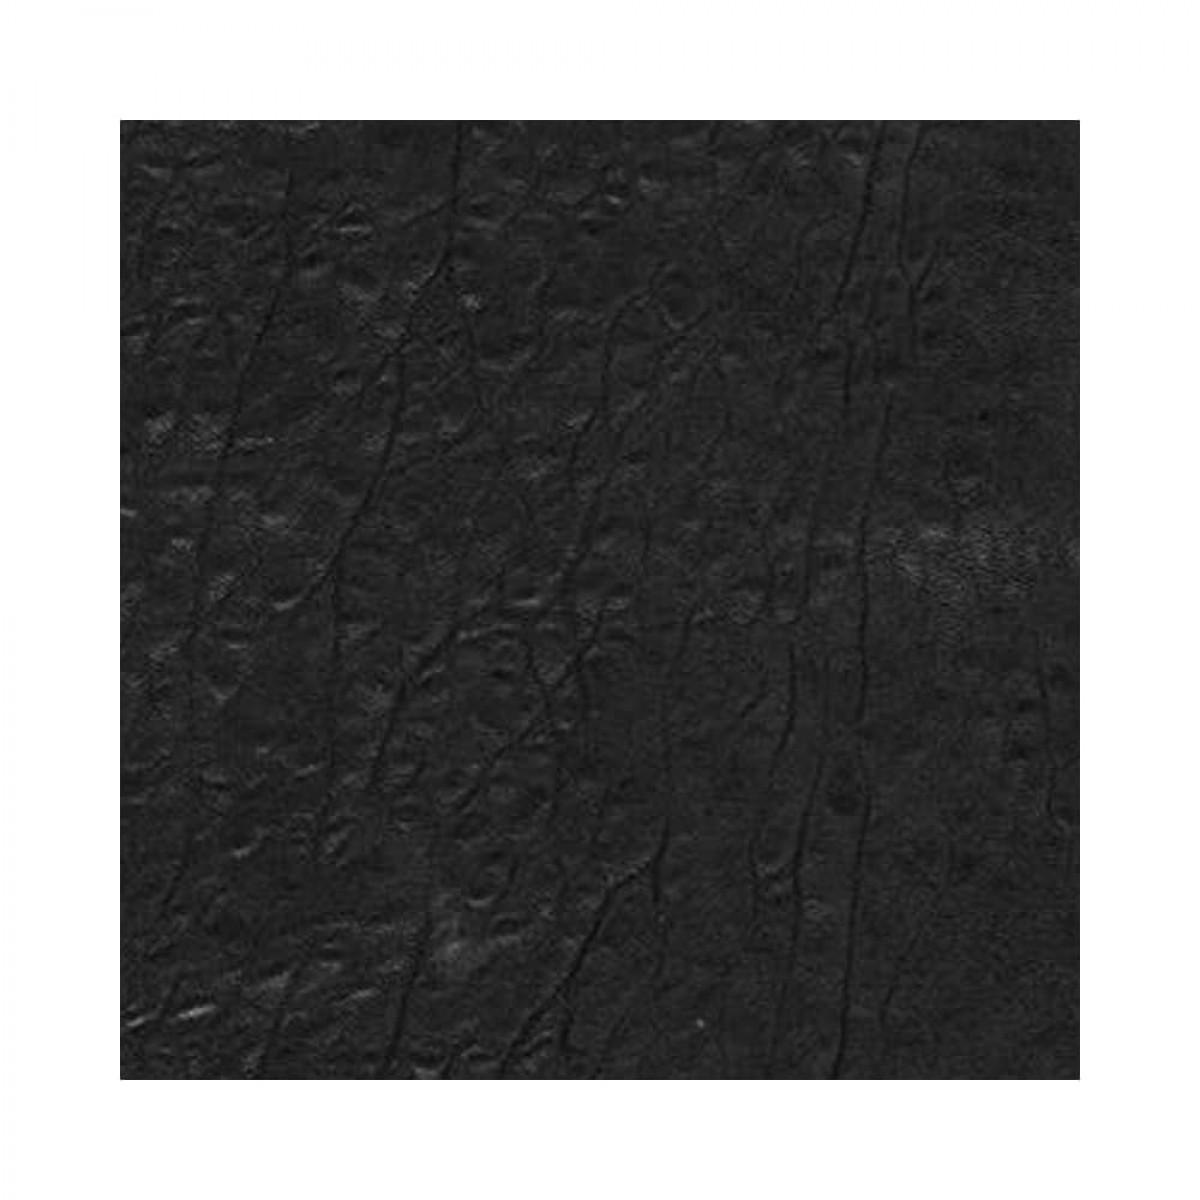 jerome dreyfuss billy m taske - black - kvalitet